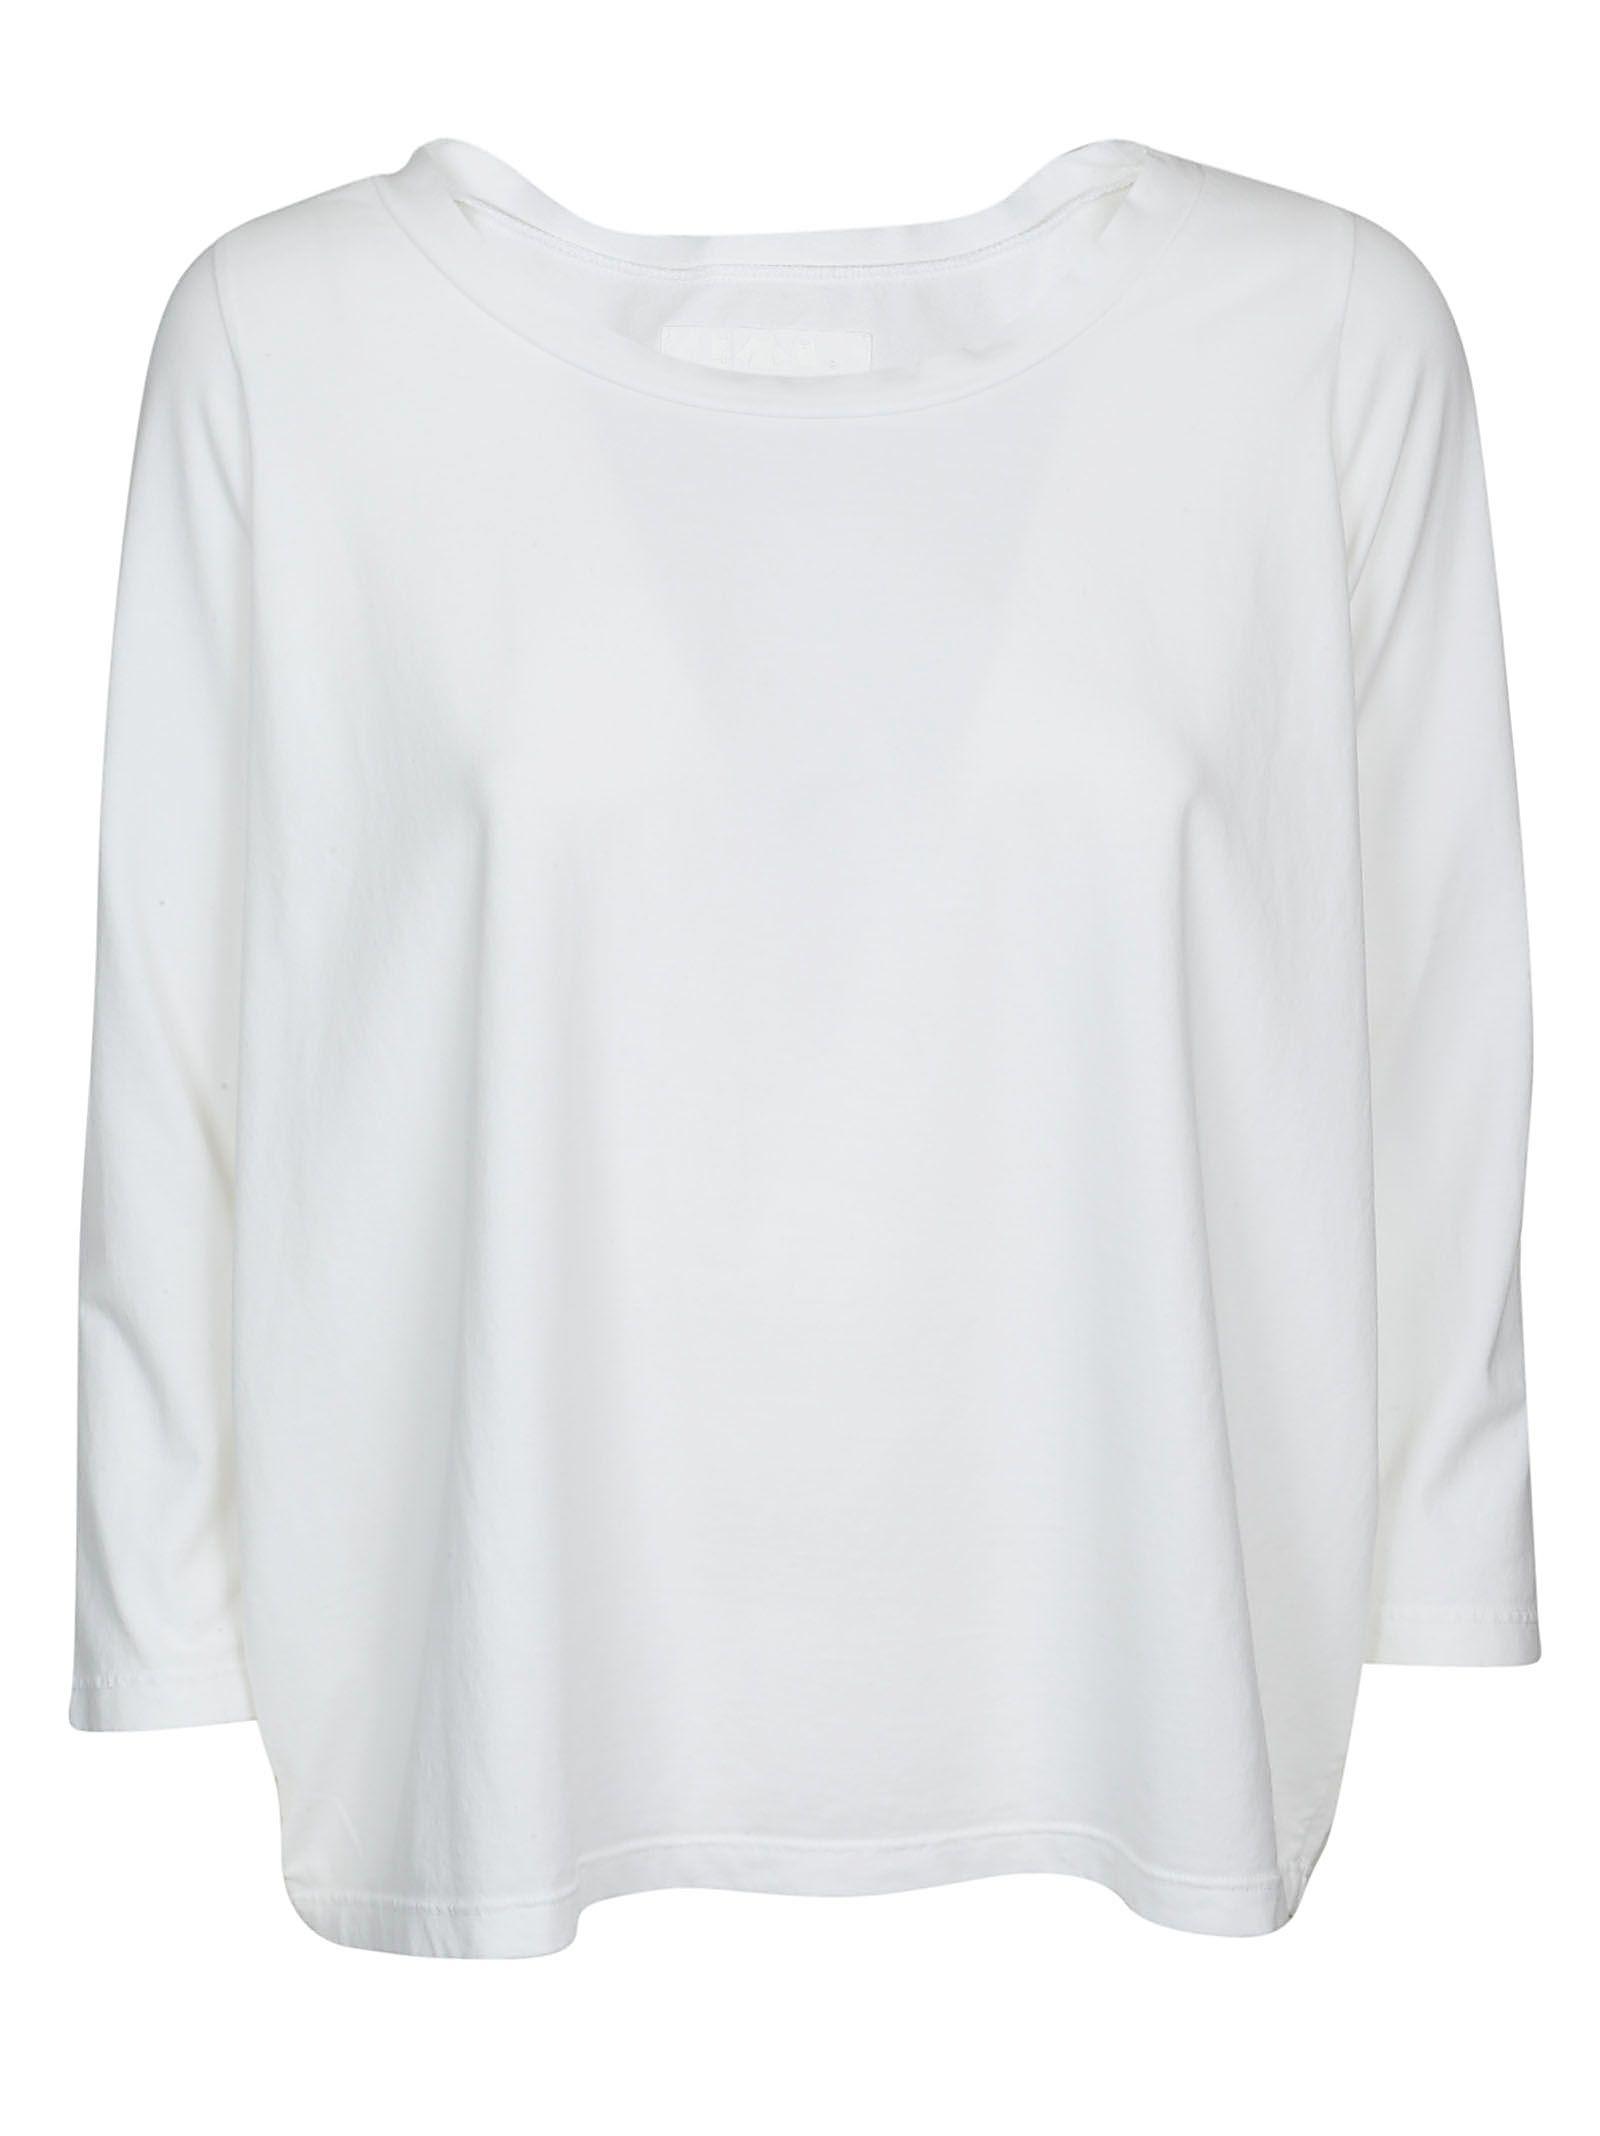 Labo. art Wide Neck T-shirt